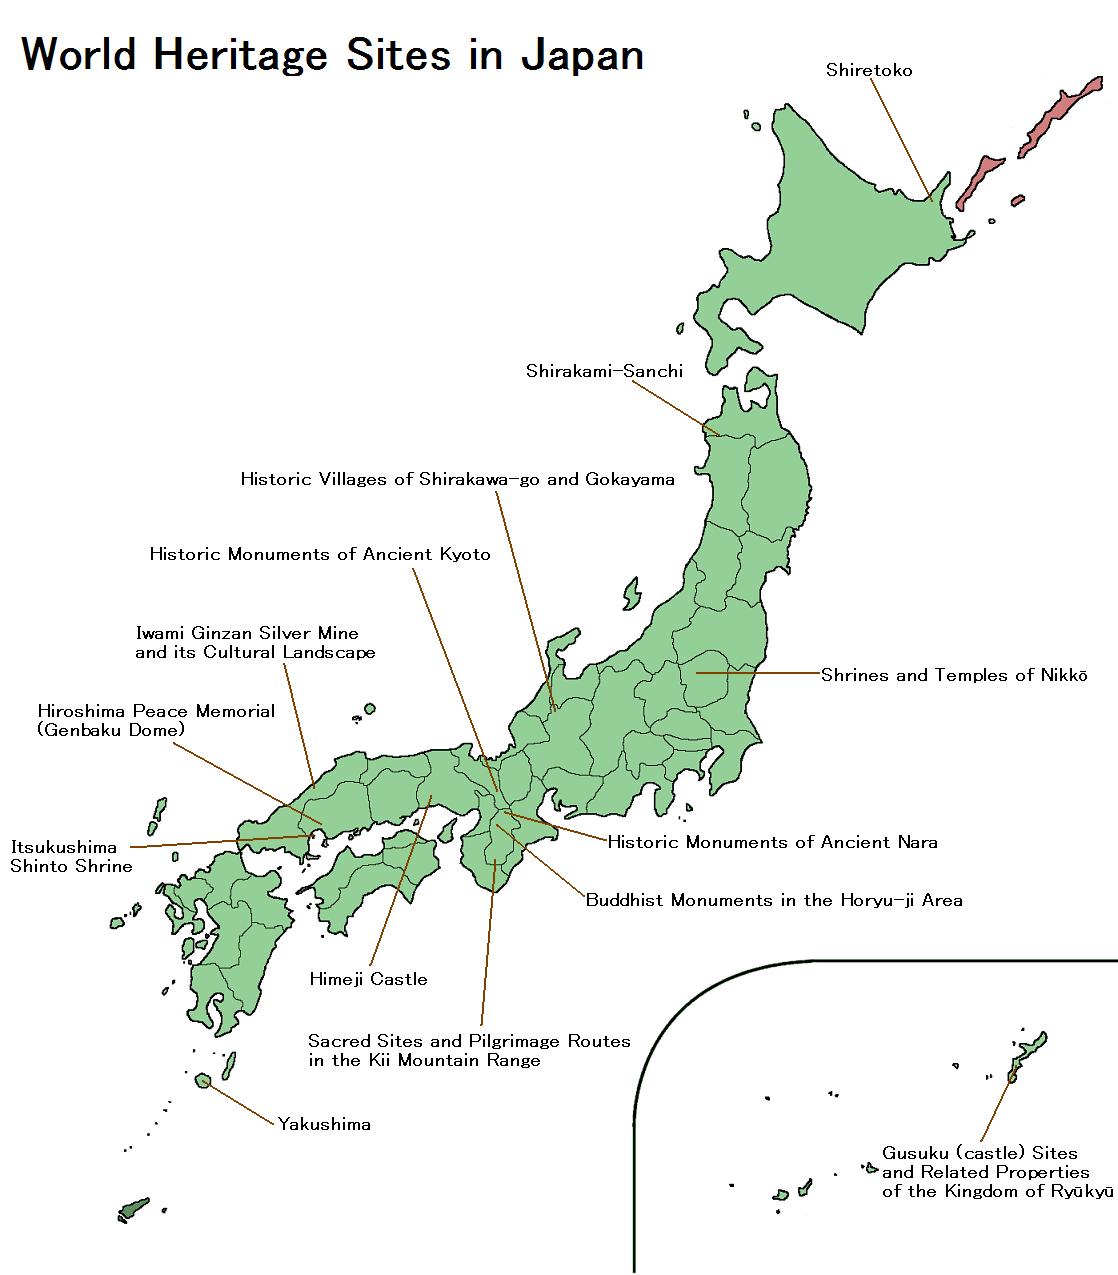 Outline of japan wikipedia e picfo outline of japan wikipedia altavistaventures Gallery